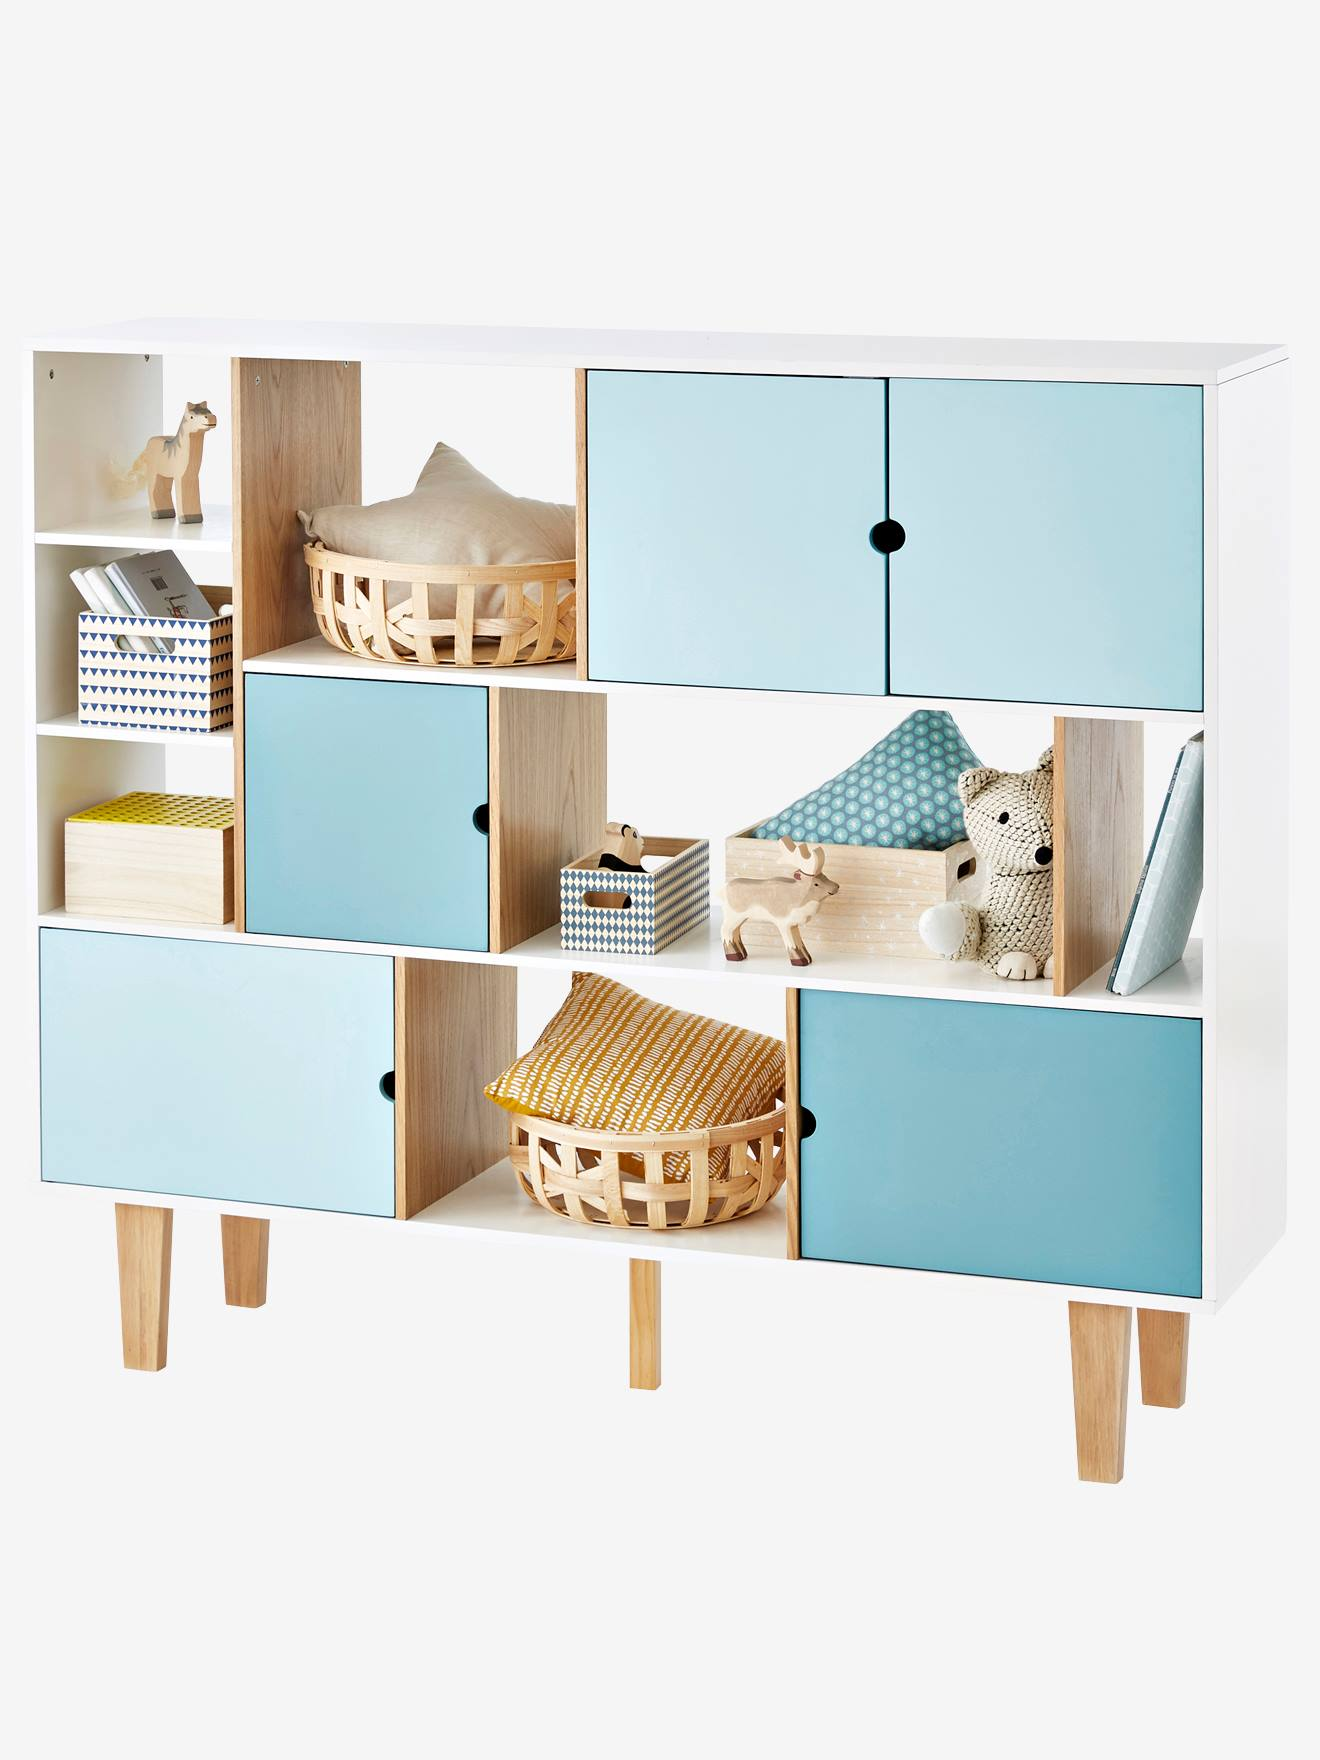 bibliotheque vertbaudet achat vente de bibliotheque pas cher. Black Bedroom Furniture Sets. Home Design Ideas